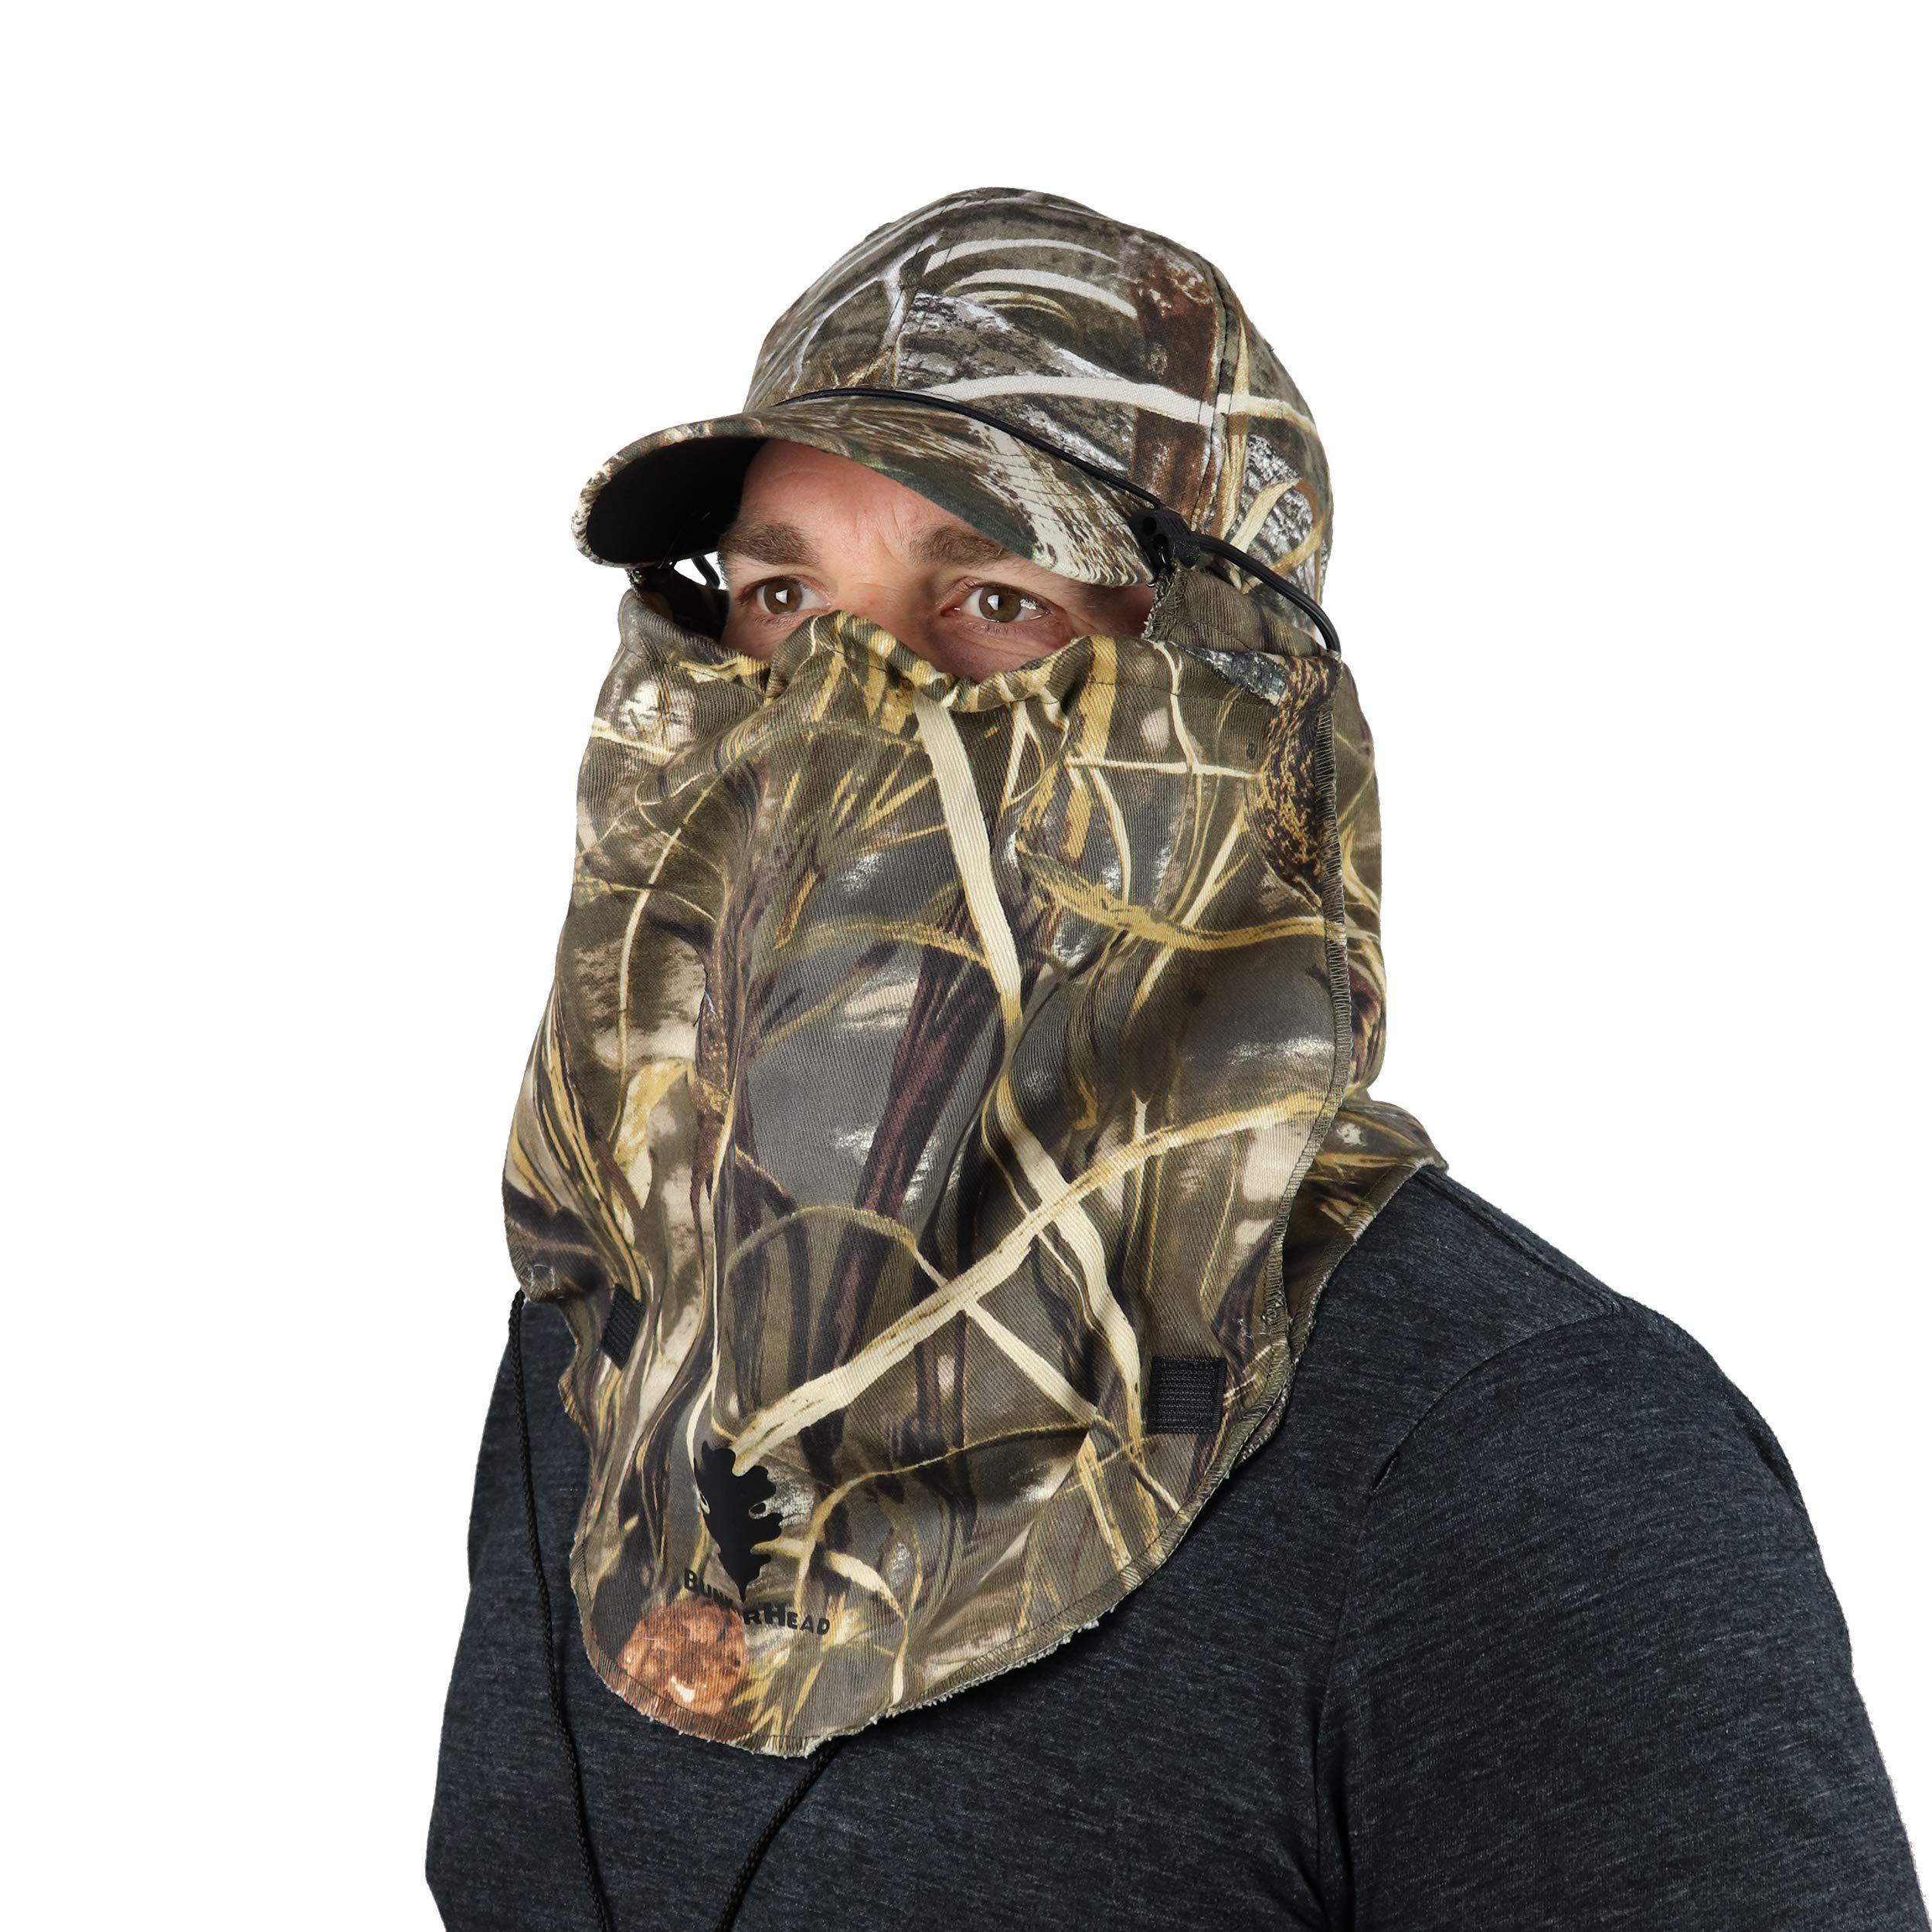 BunkerHead Cotton Camo Head Concealment System